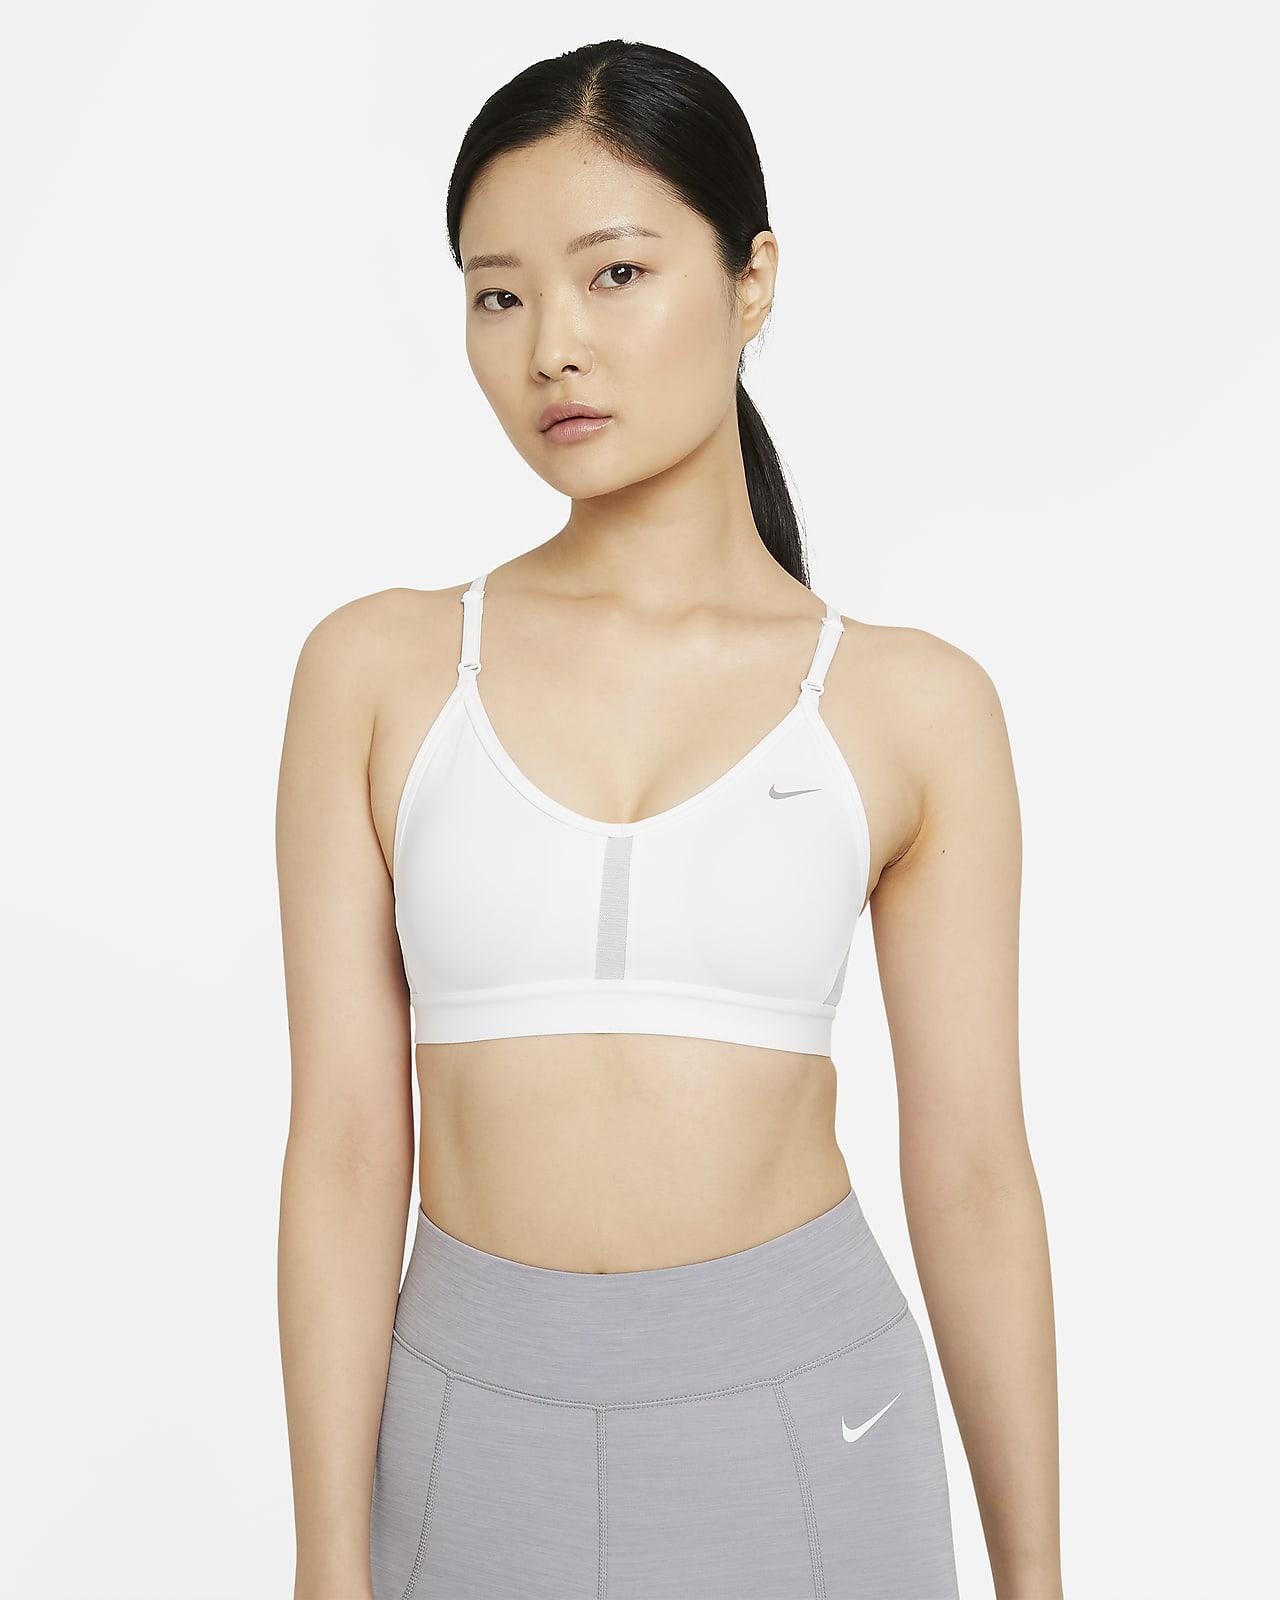 Nike Indy Women's Light-Support Padded V-Neck Sports Bra